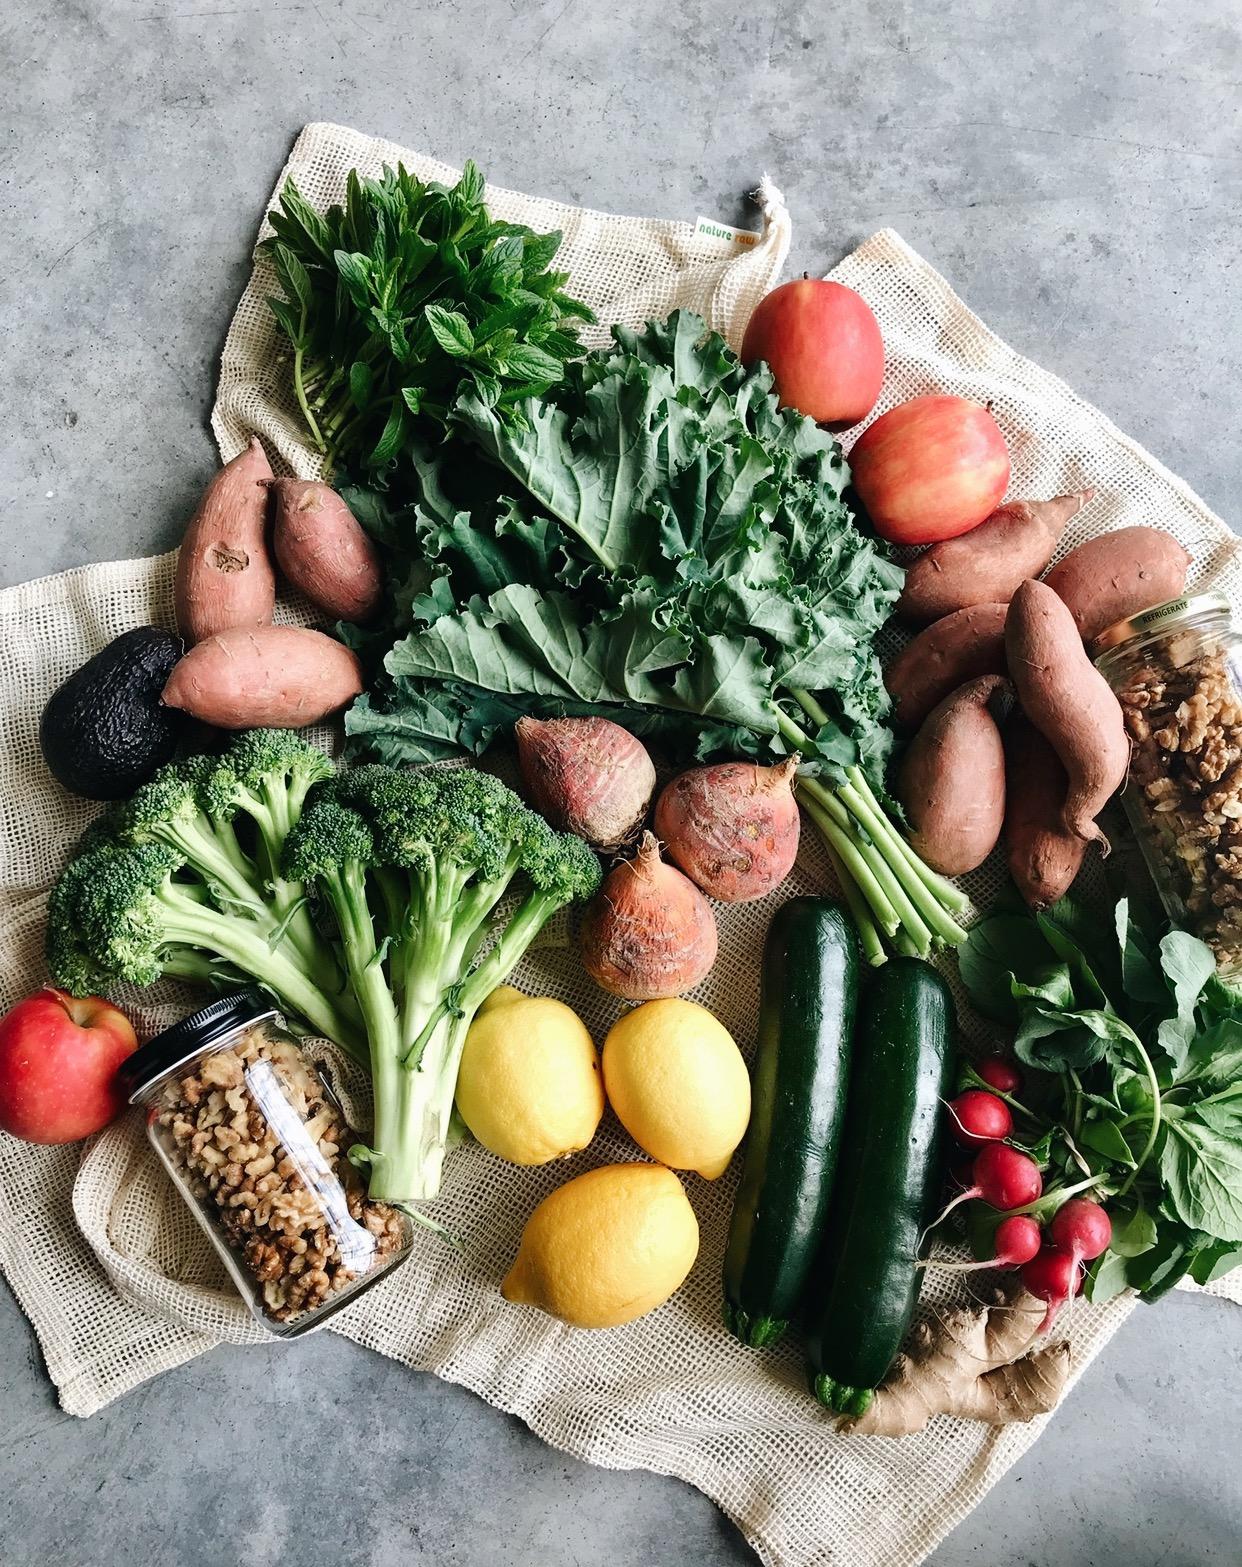 MIKC-Farmers-Market-Guide-1.JPG